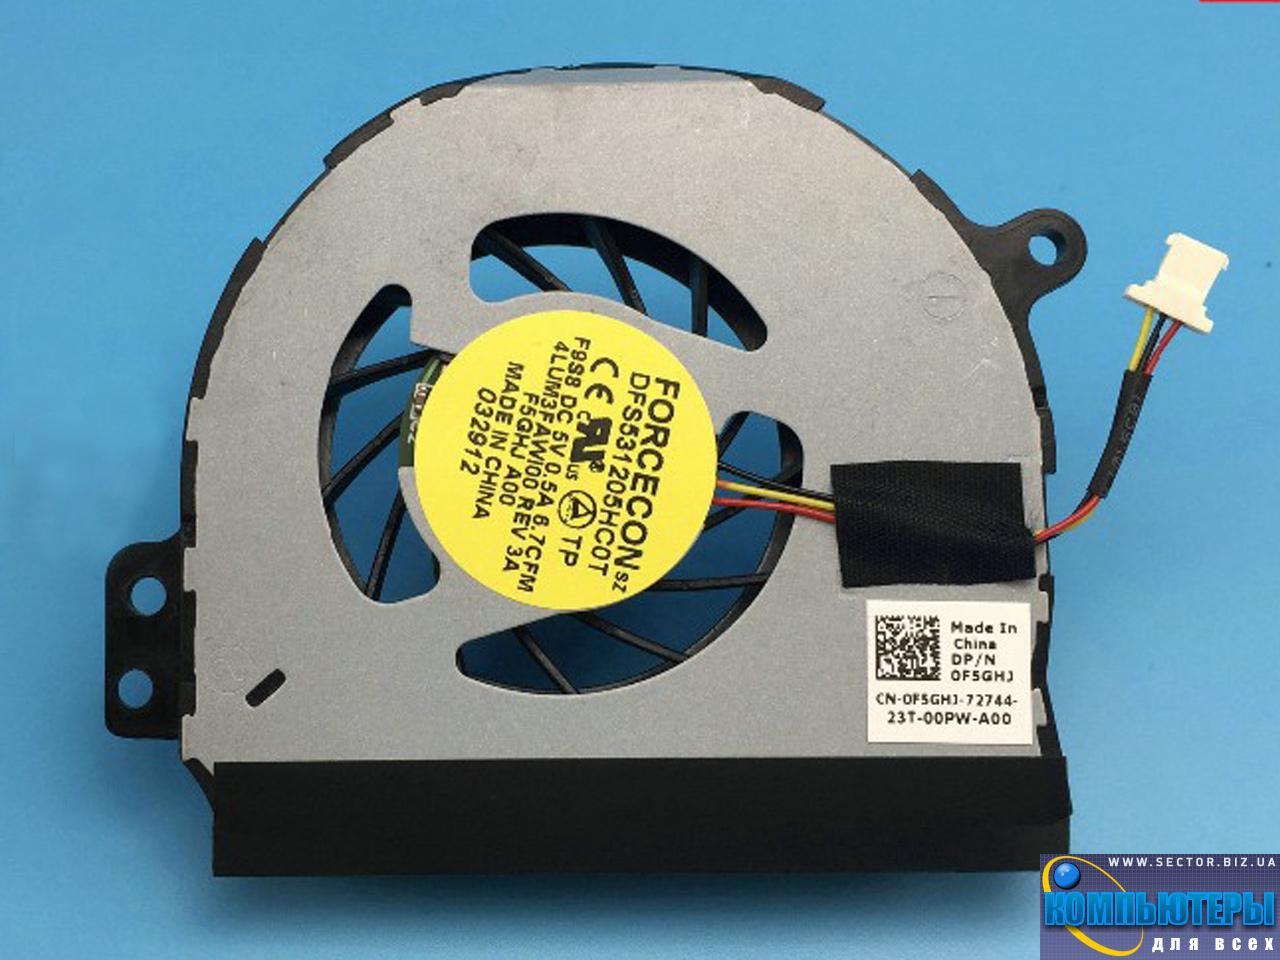 Кулер к ноутбуку Dell Inspiron 1464 1564 1764 P07E P08F P09G p/n: DFS531205HC0T F9S8. Фото № 3.